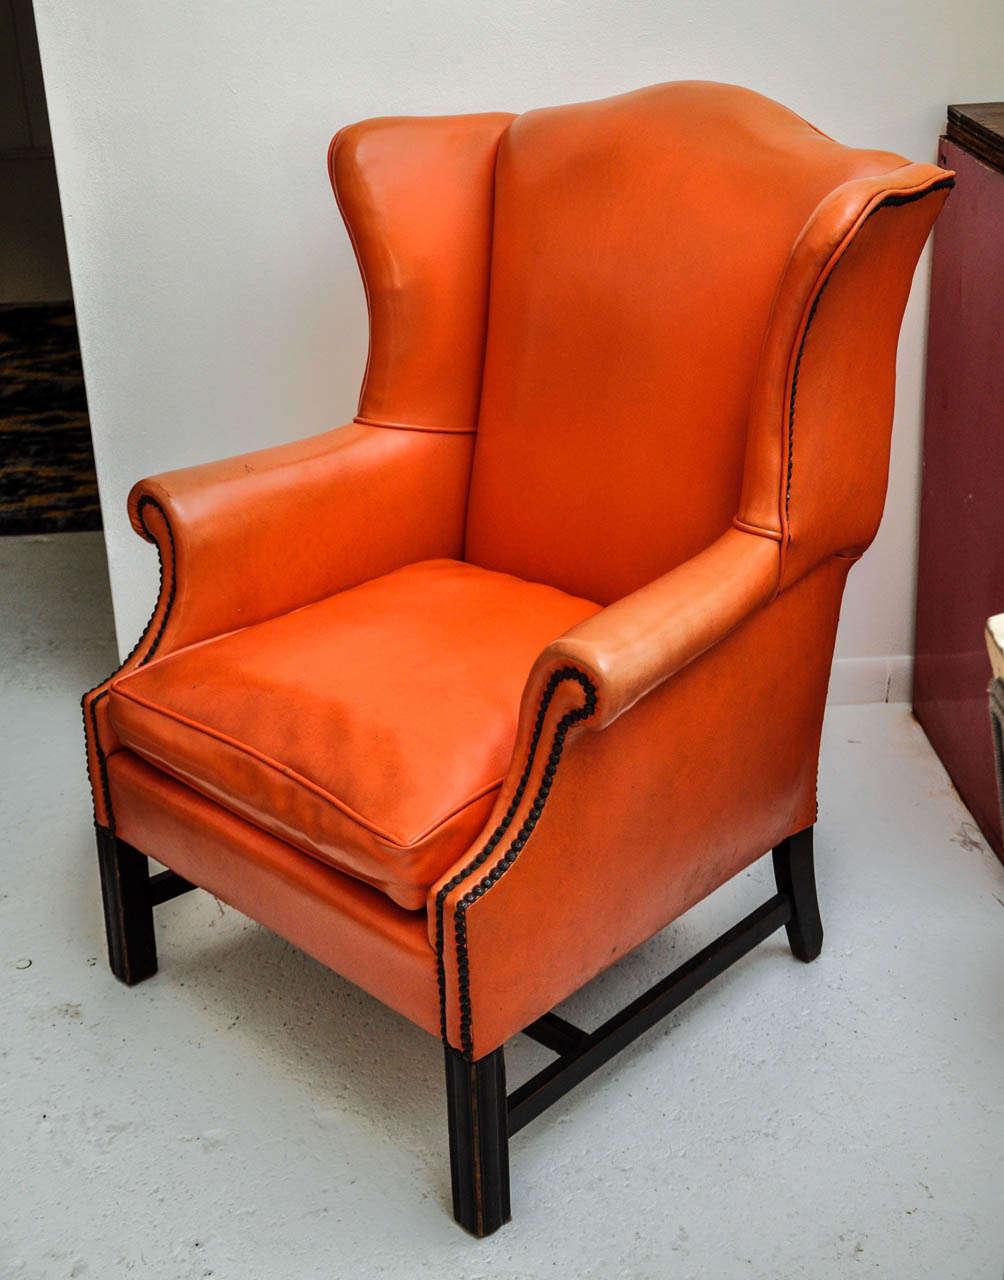 Vintage Orange Leather Wing Chair at 1stdibs